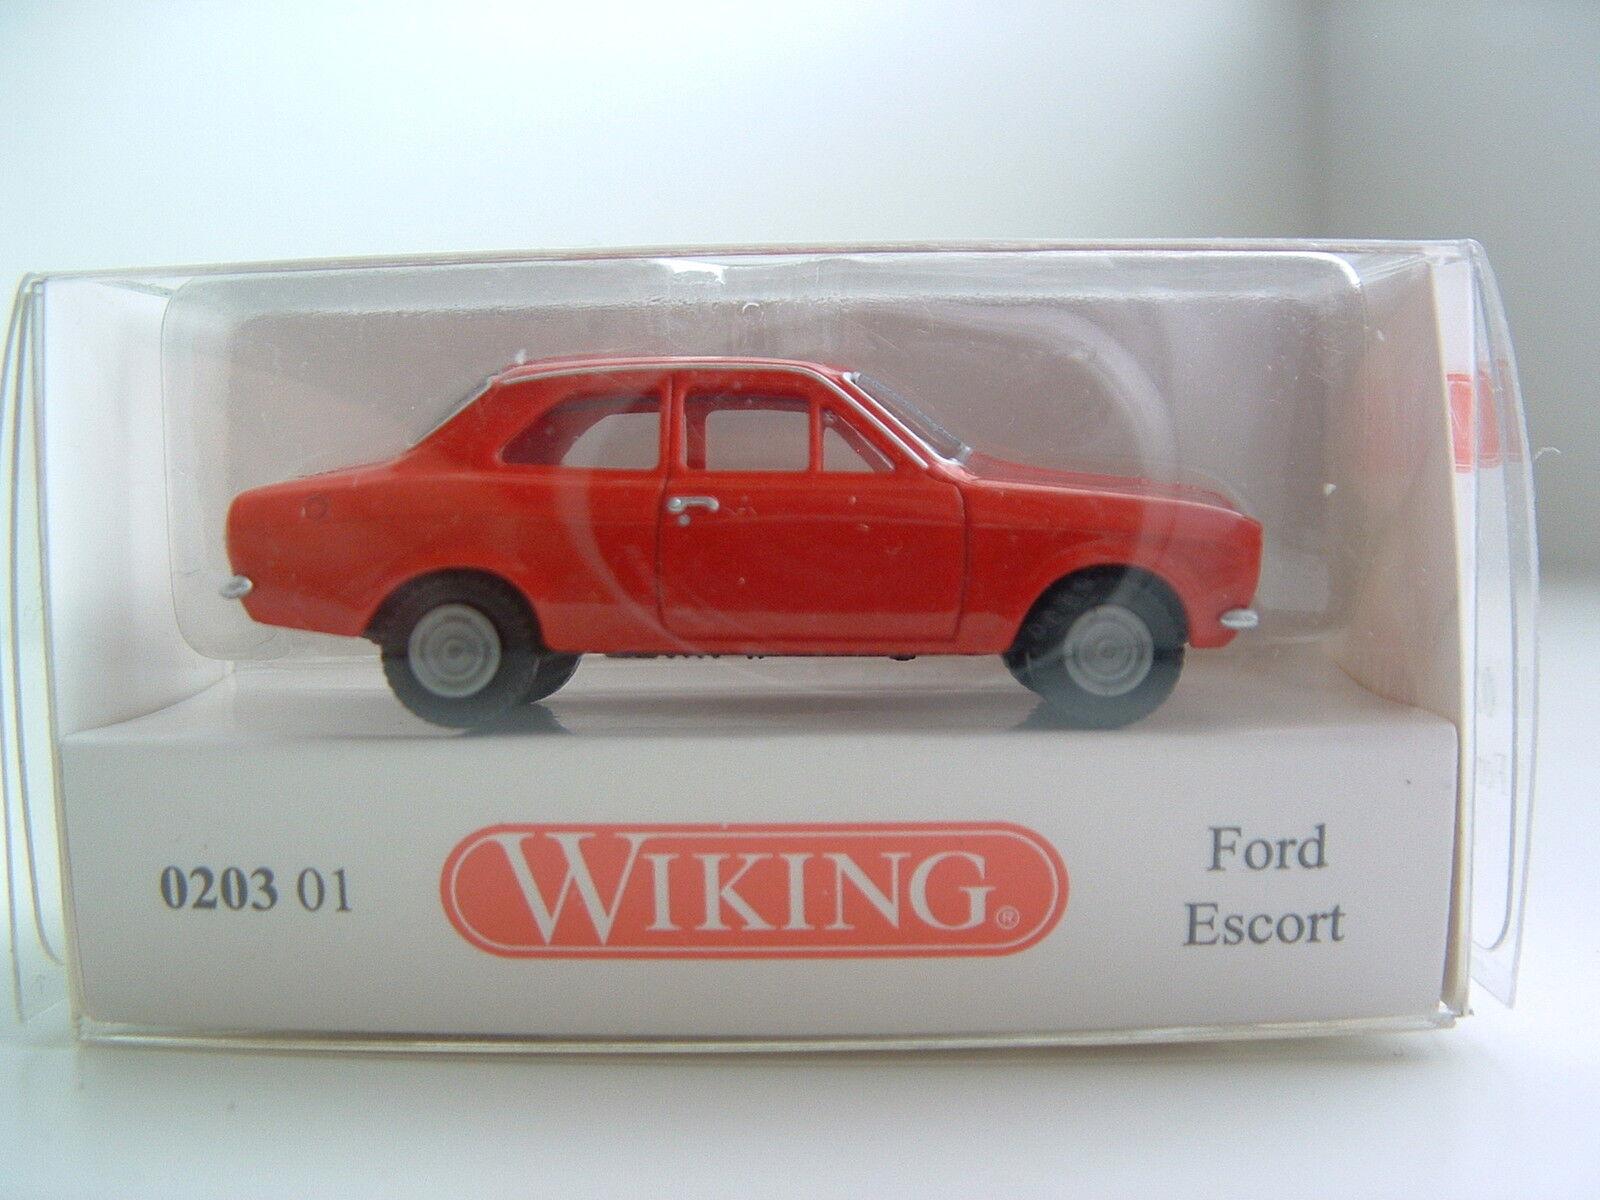 Wiking 0203 01 H0 1 87 Ford Escort OVP B228